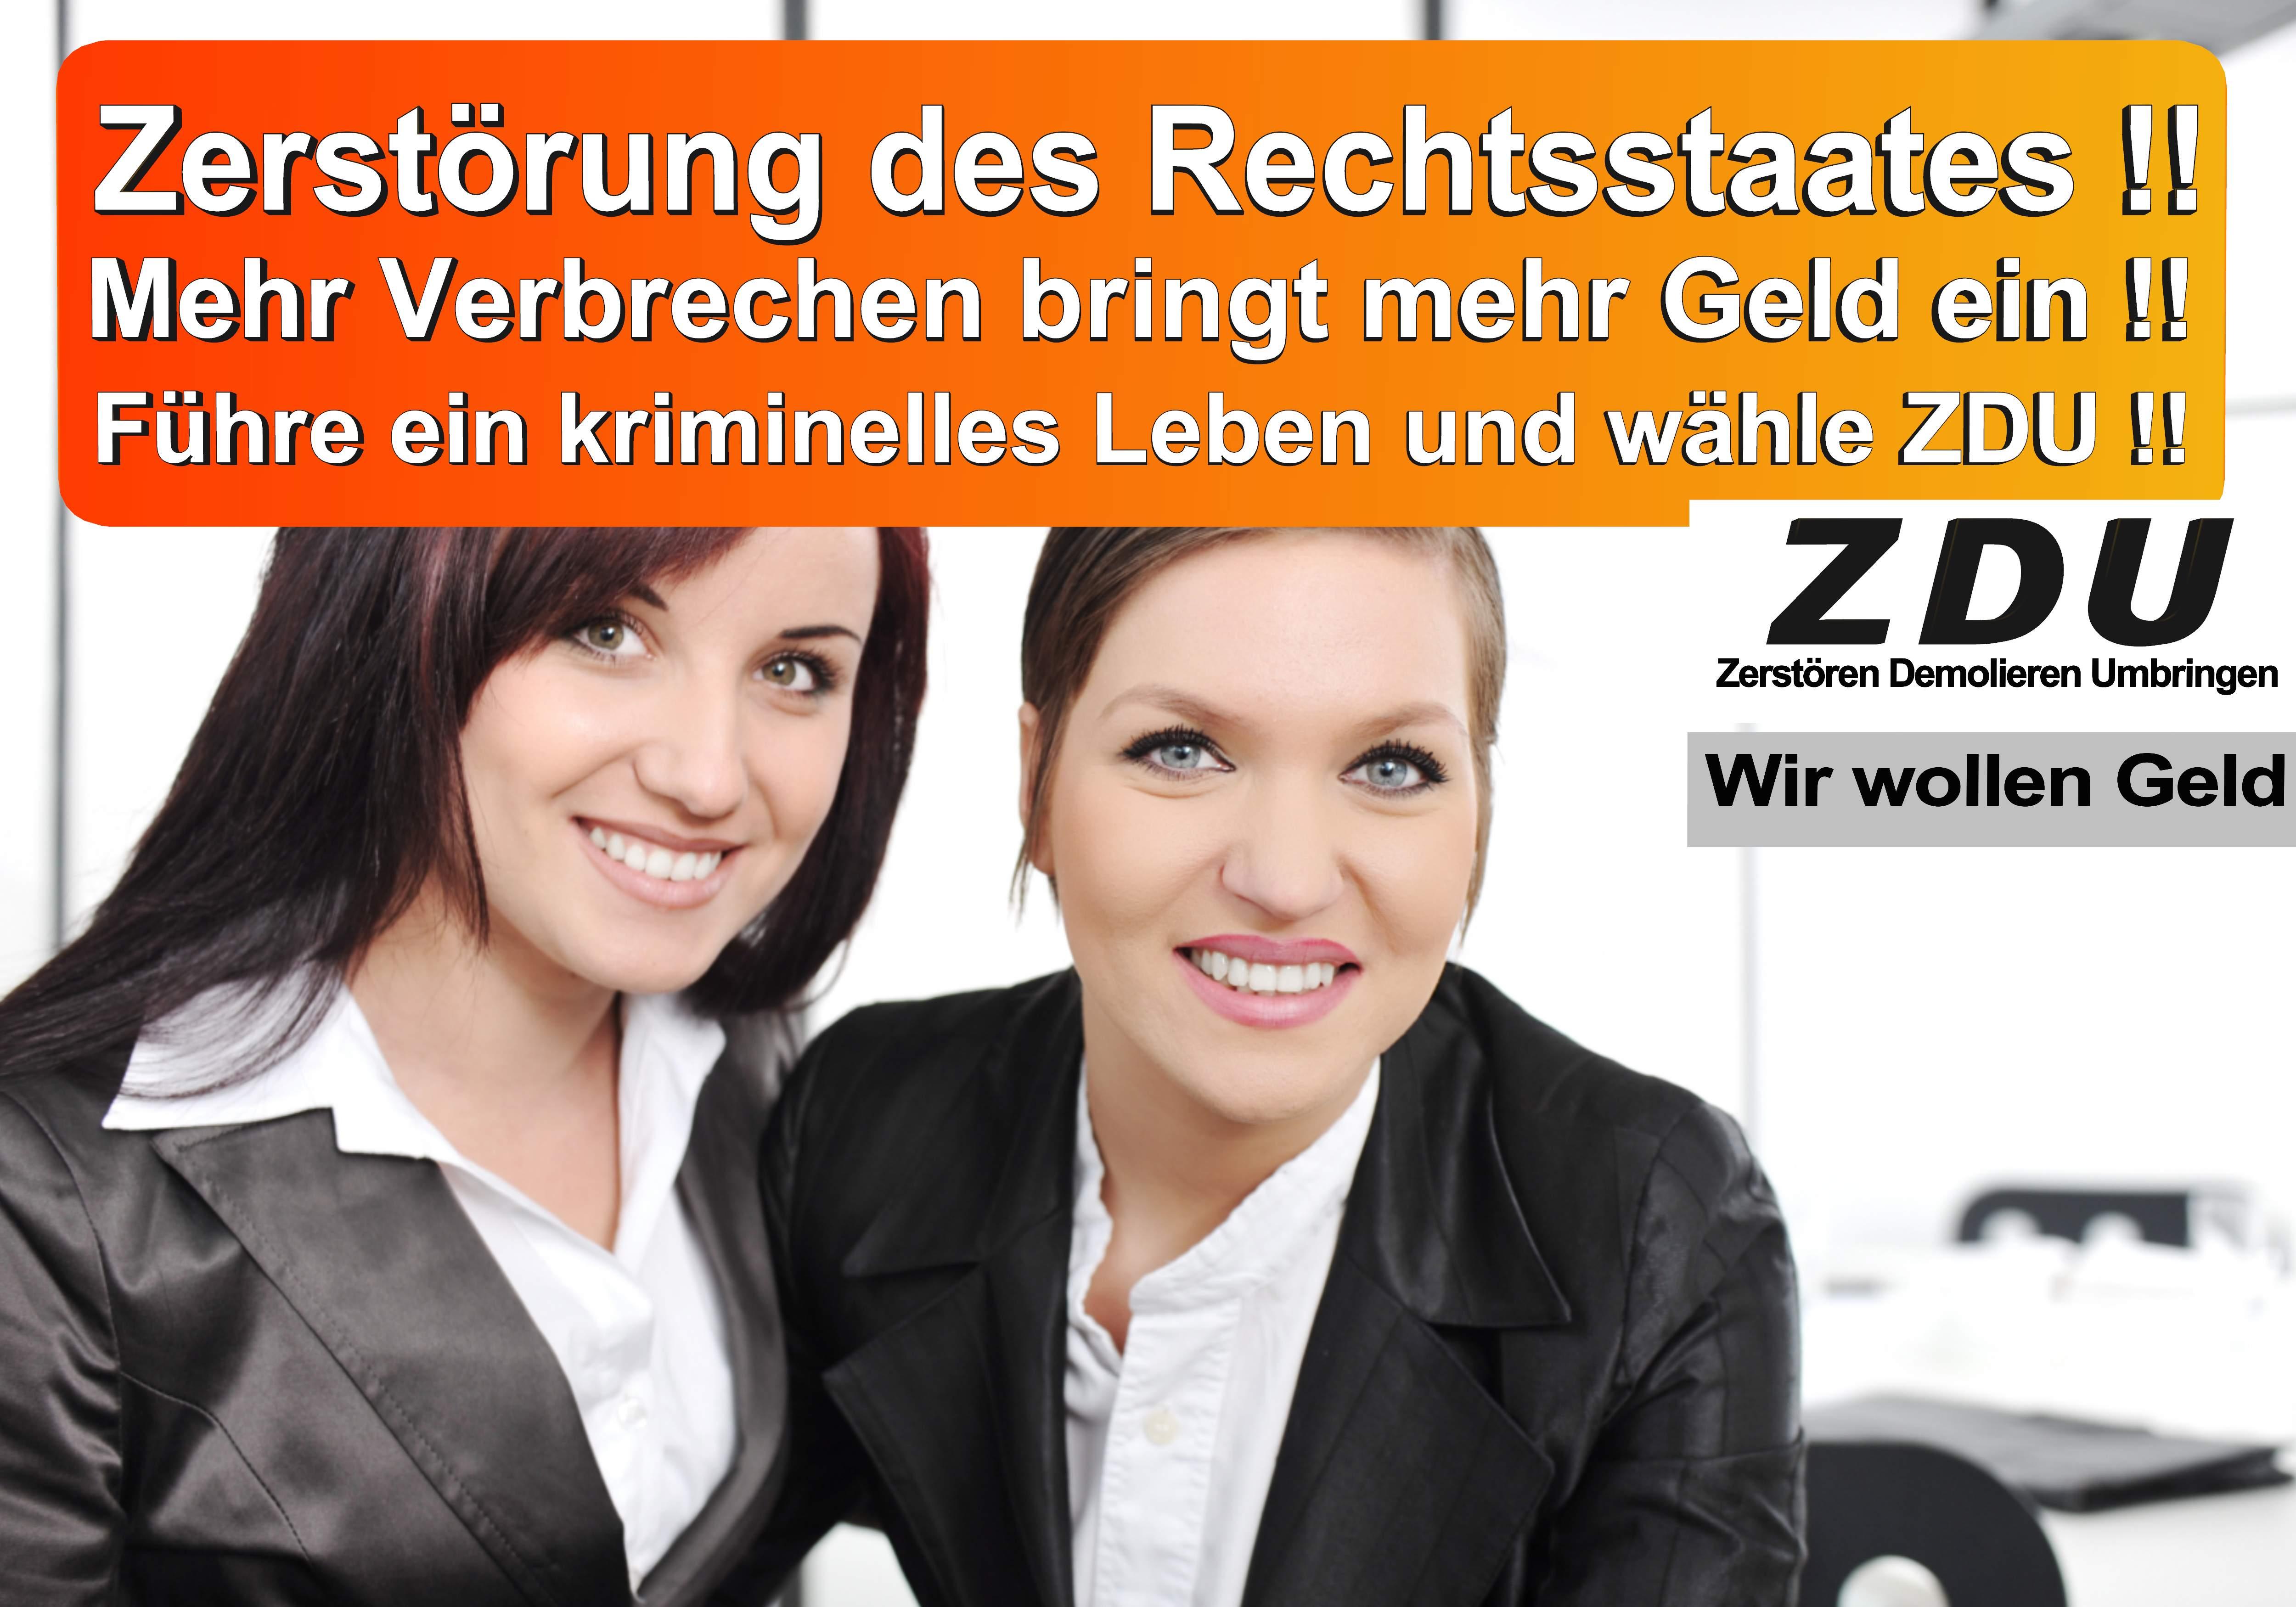 Bundestagswahl 2017 CDU SPD AfD Wahlplakat Angela Merkel CDU CSU (23)